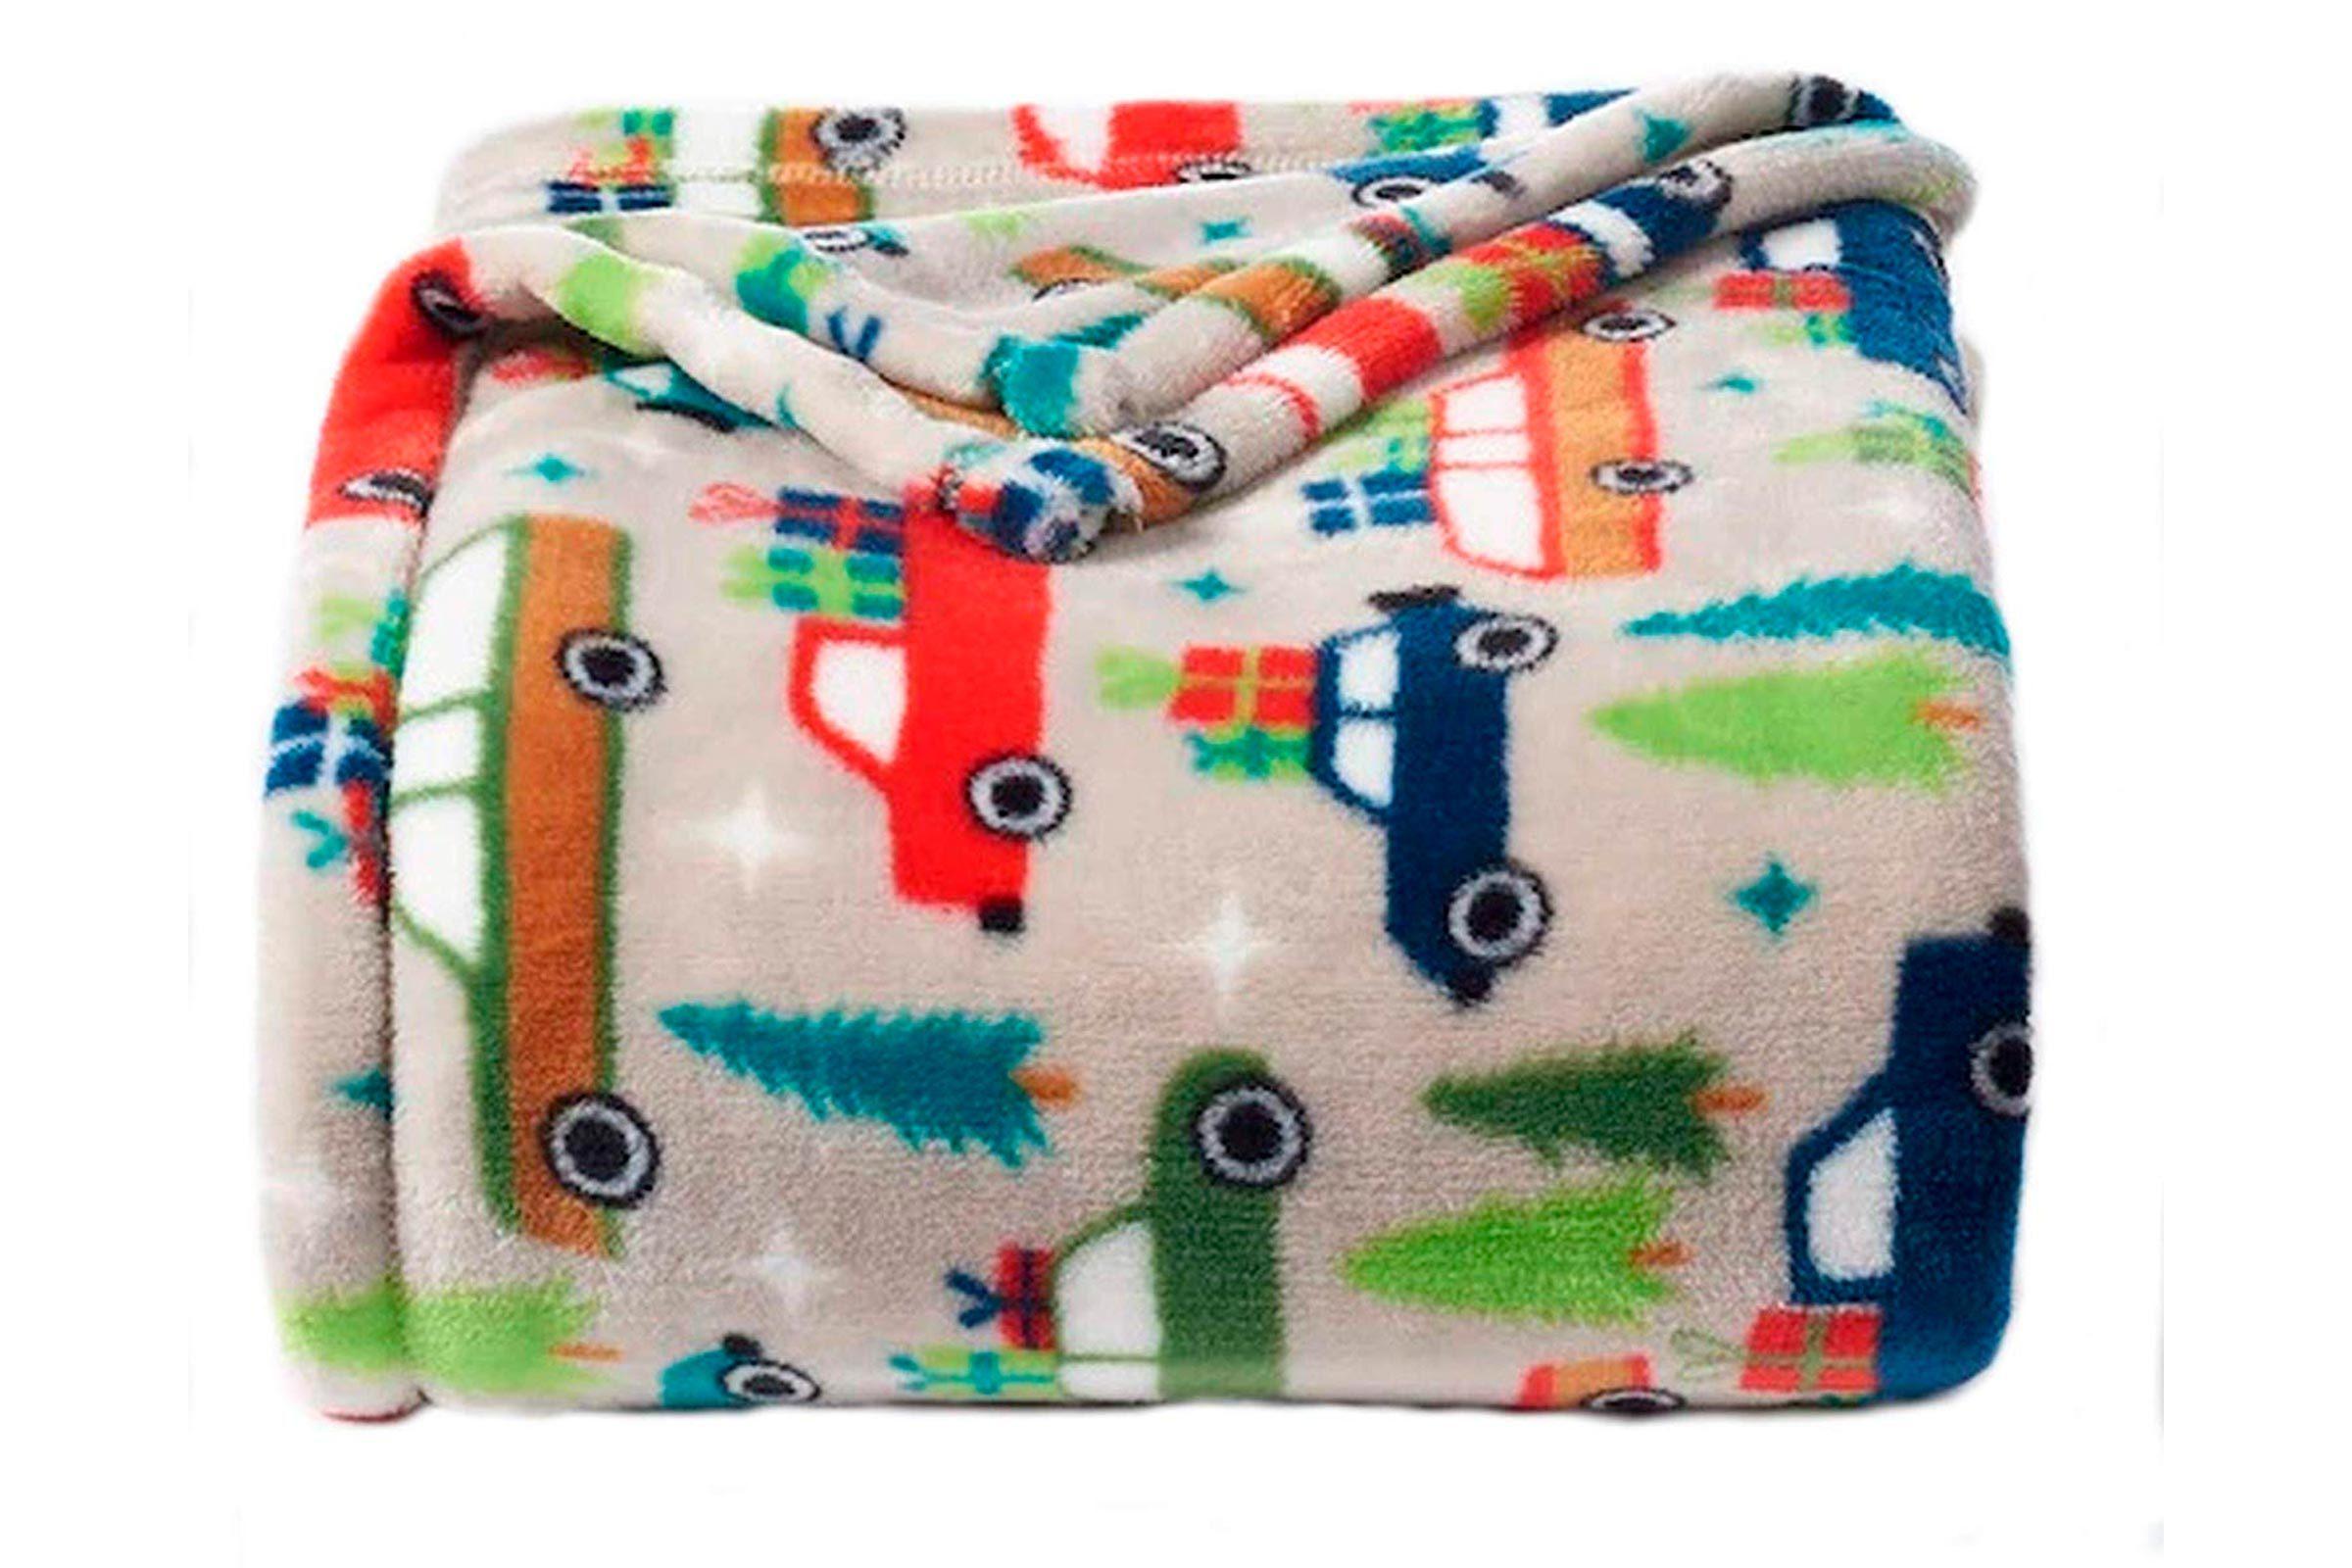 Oversized plush throw blanket